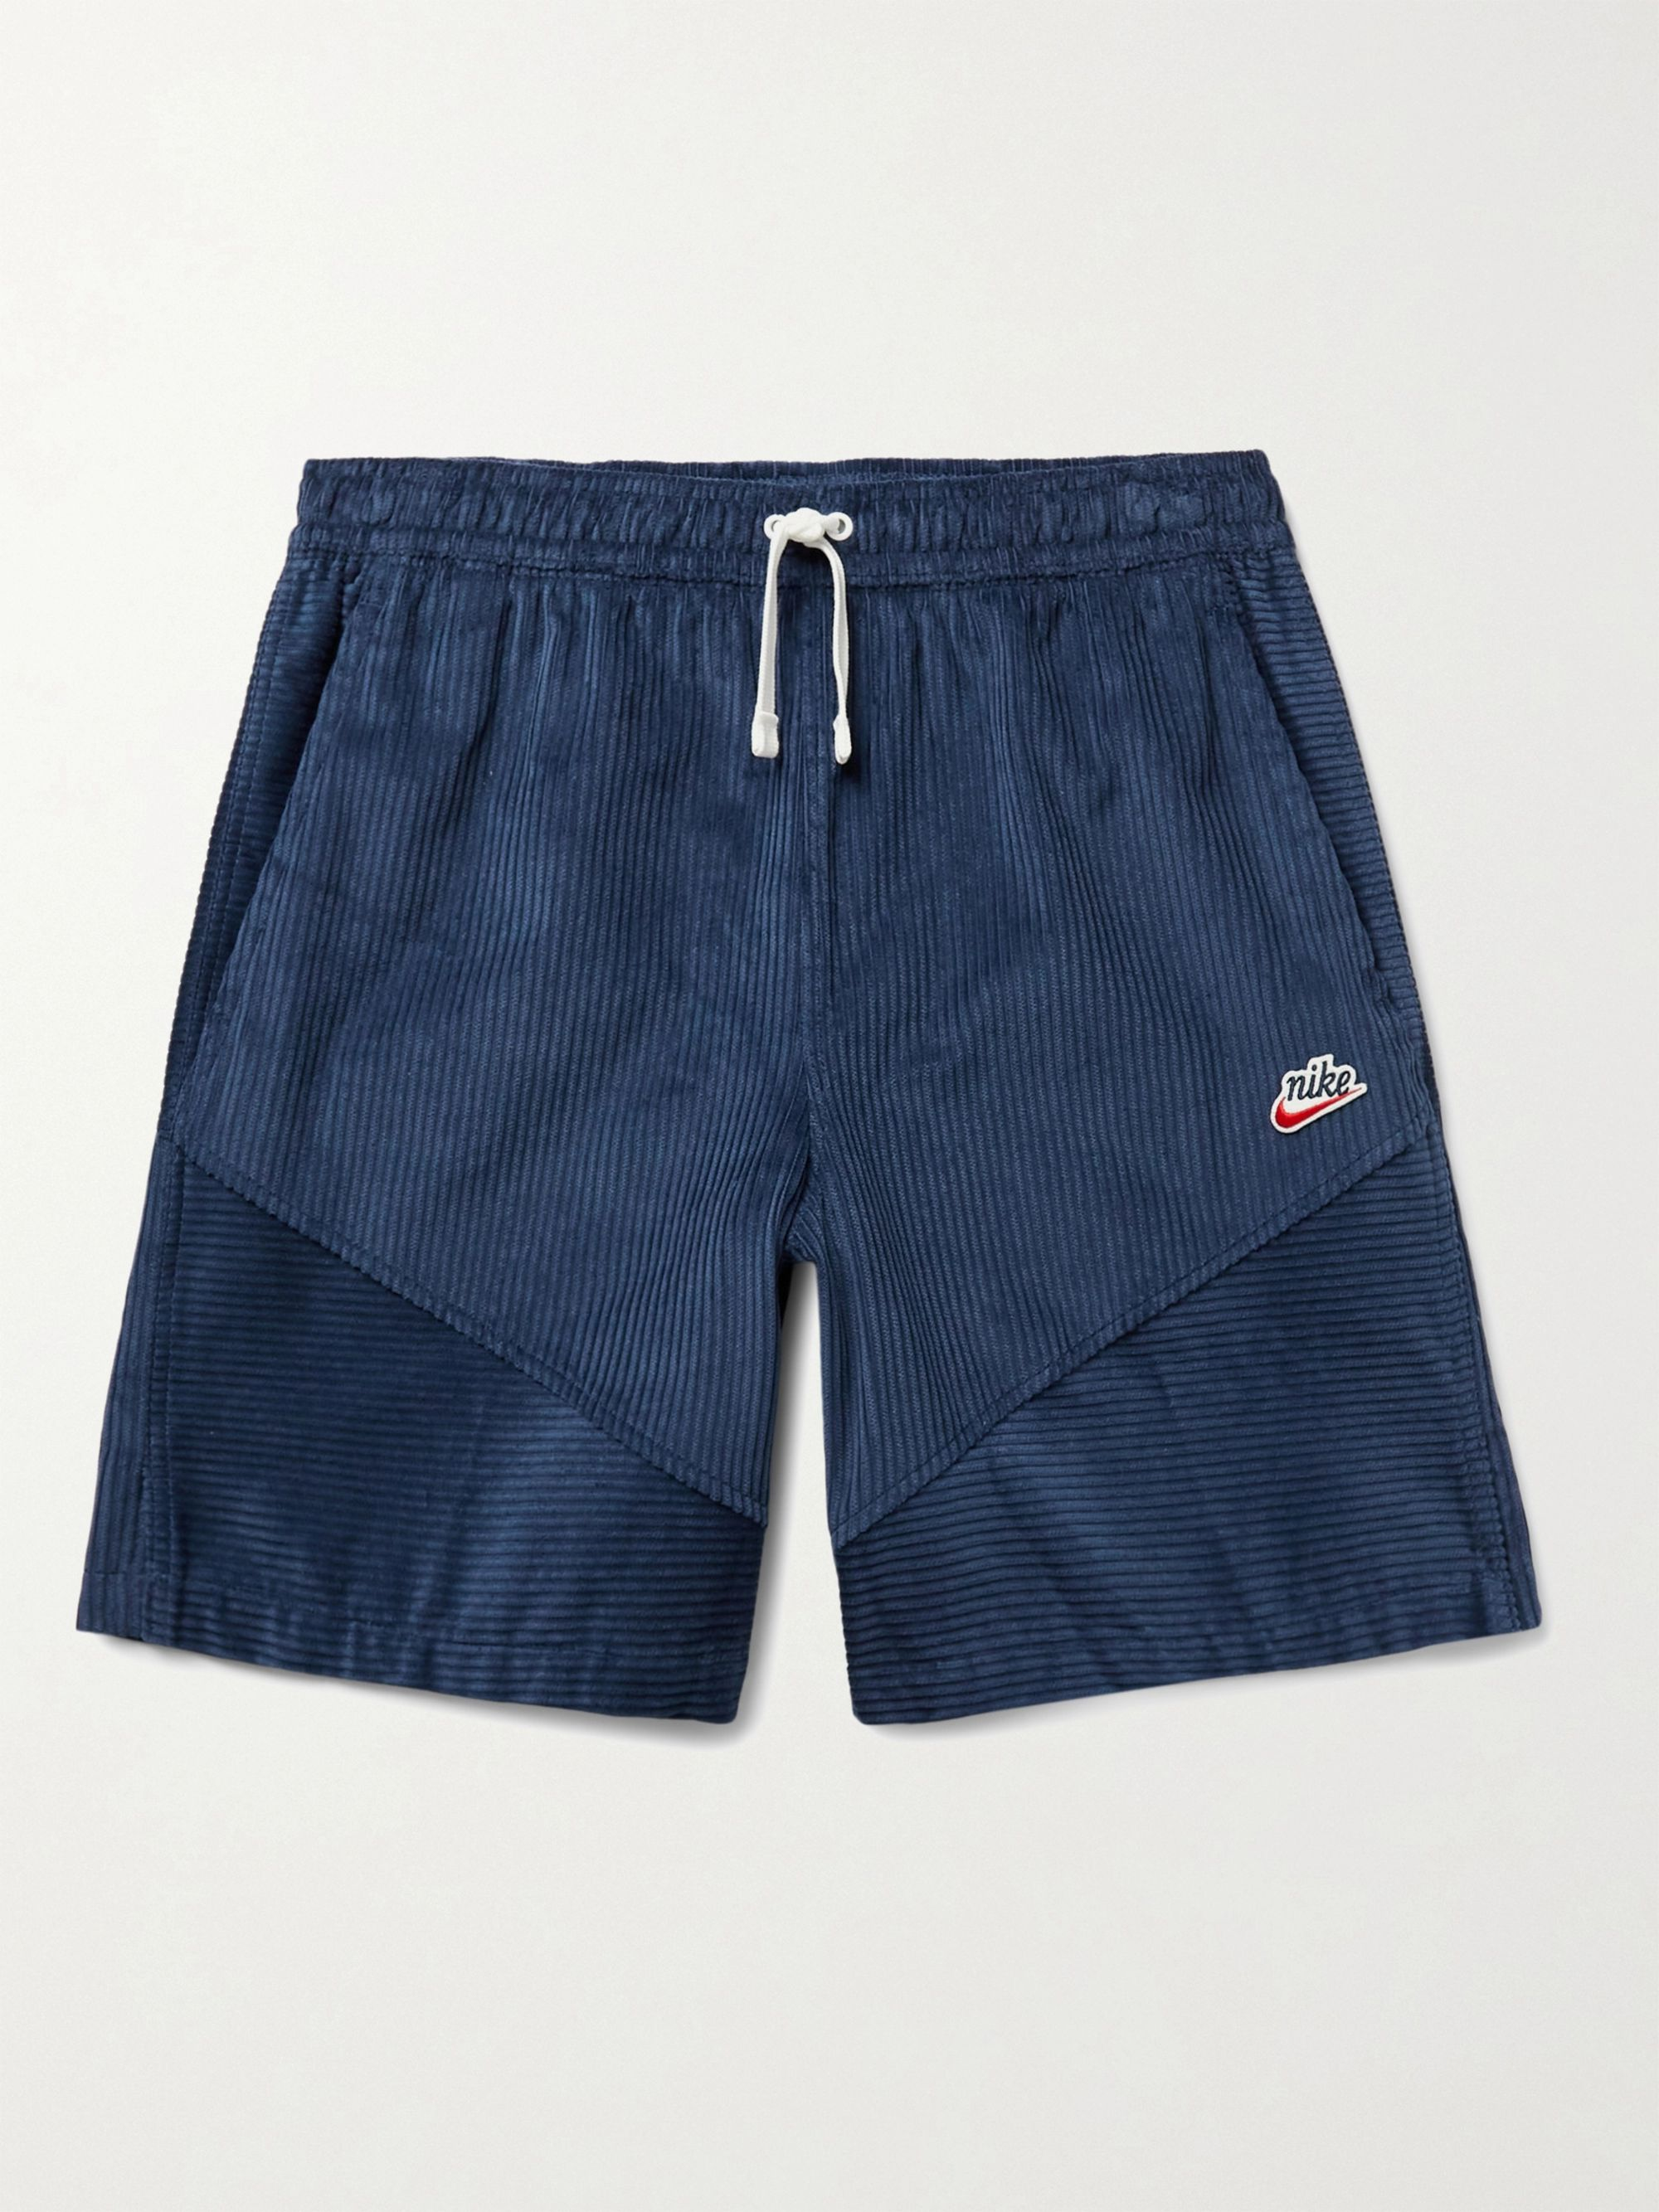 NIKE Sportswear Heritage Windrunner Wide-Leg Cotton-Corduroy Drawstring Shorts